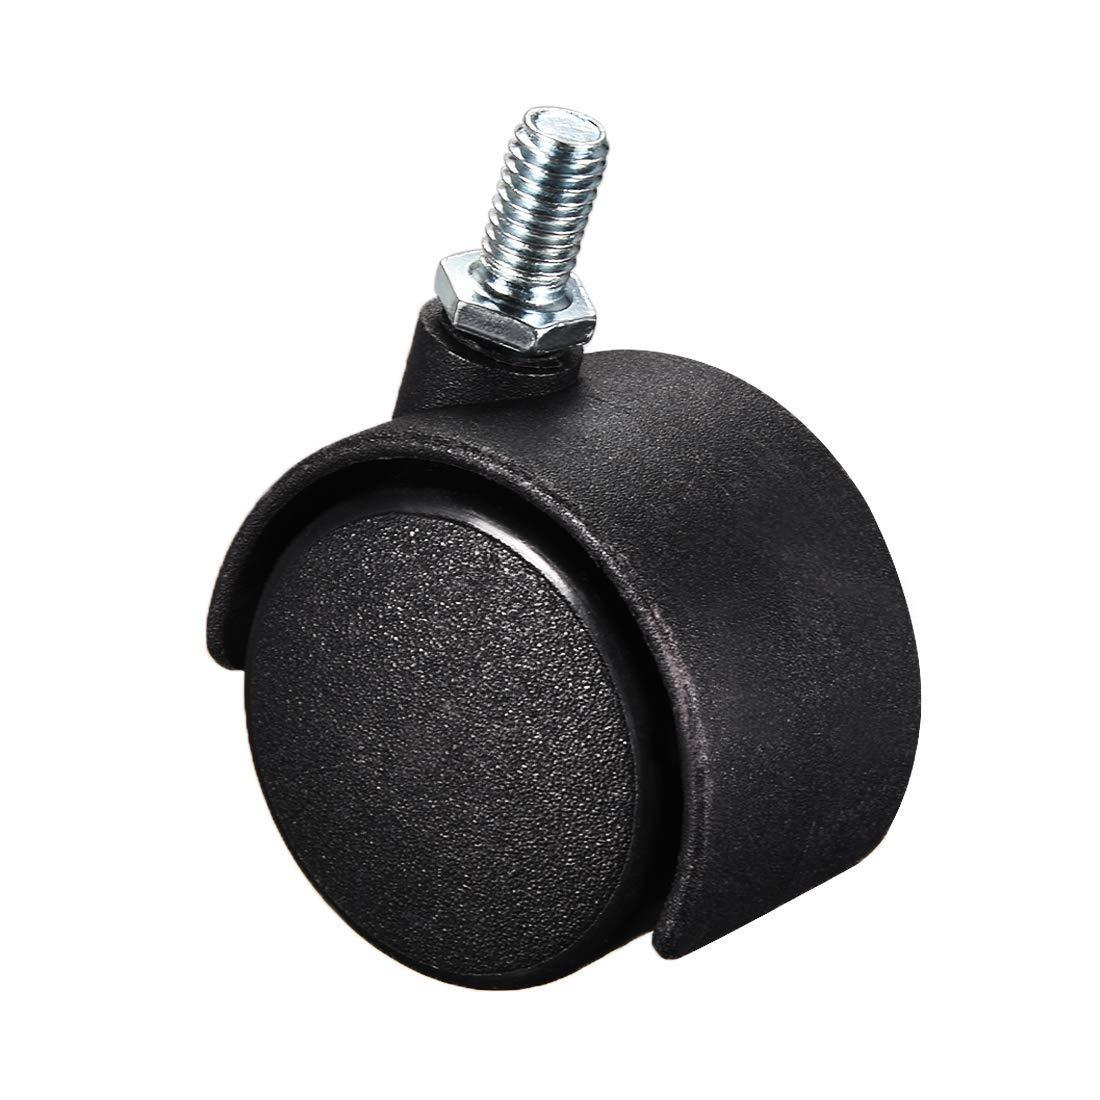 10 Pieces 33 lb Capacity Each Wheel Furniture Wheels 1.5-inch Nylon Threaded Shank Swivel Wheels M8 x 15 mm